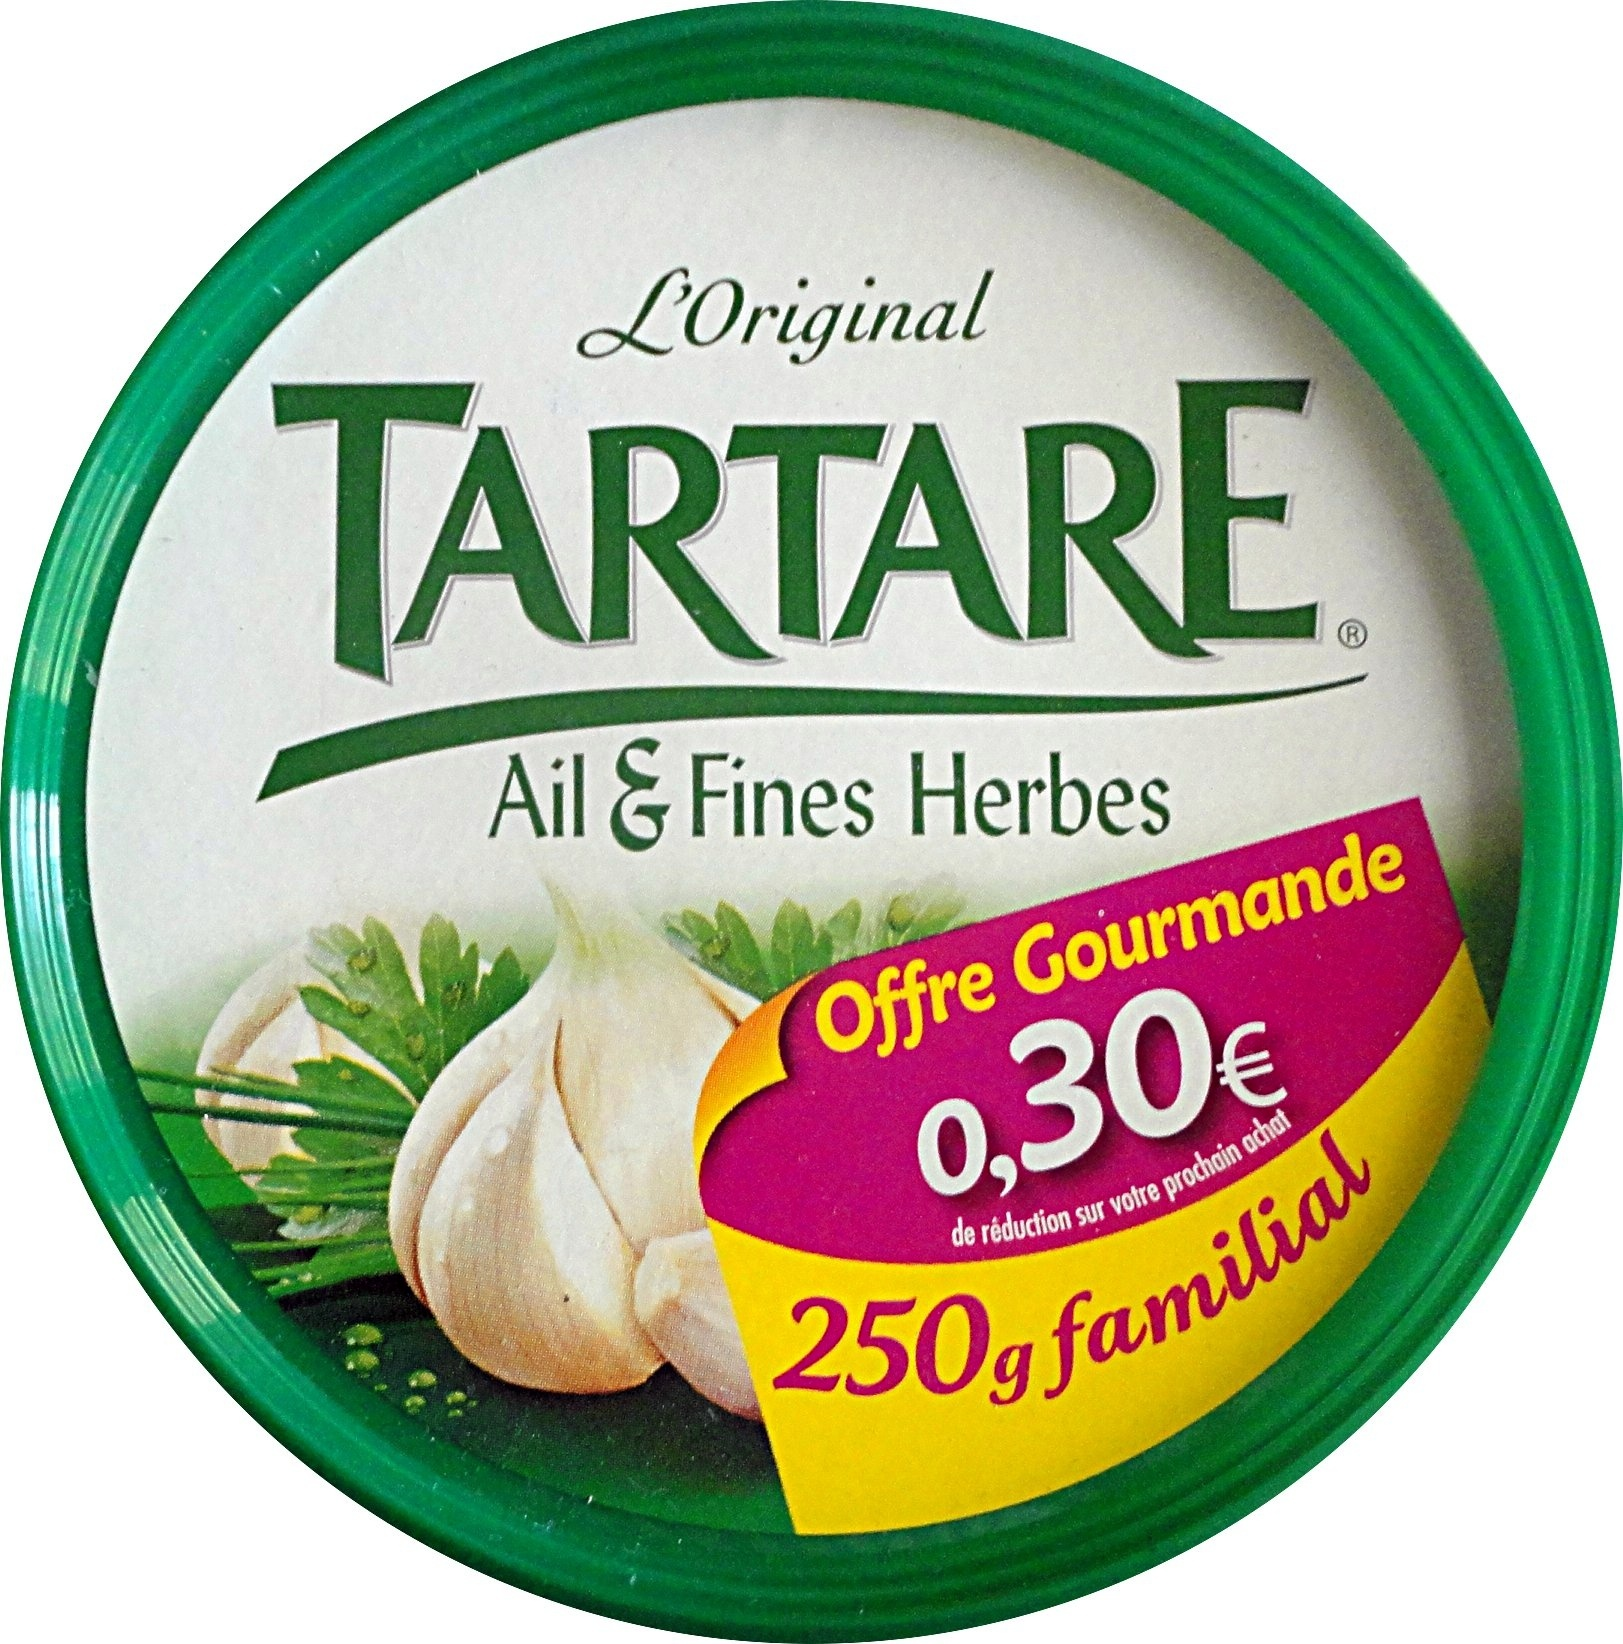 L'Original Tartare Ail & Fines herbes - Produit